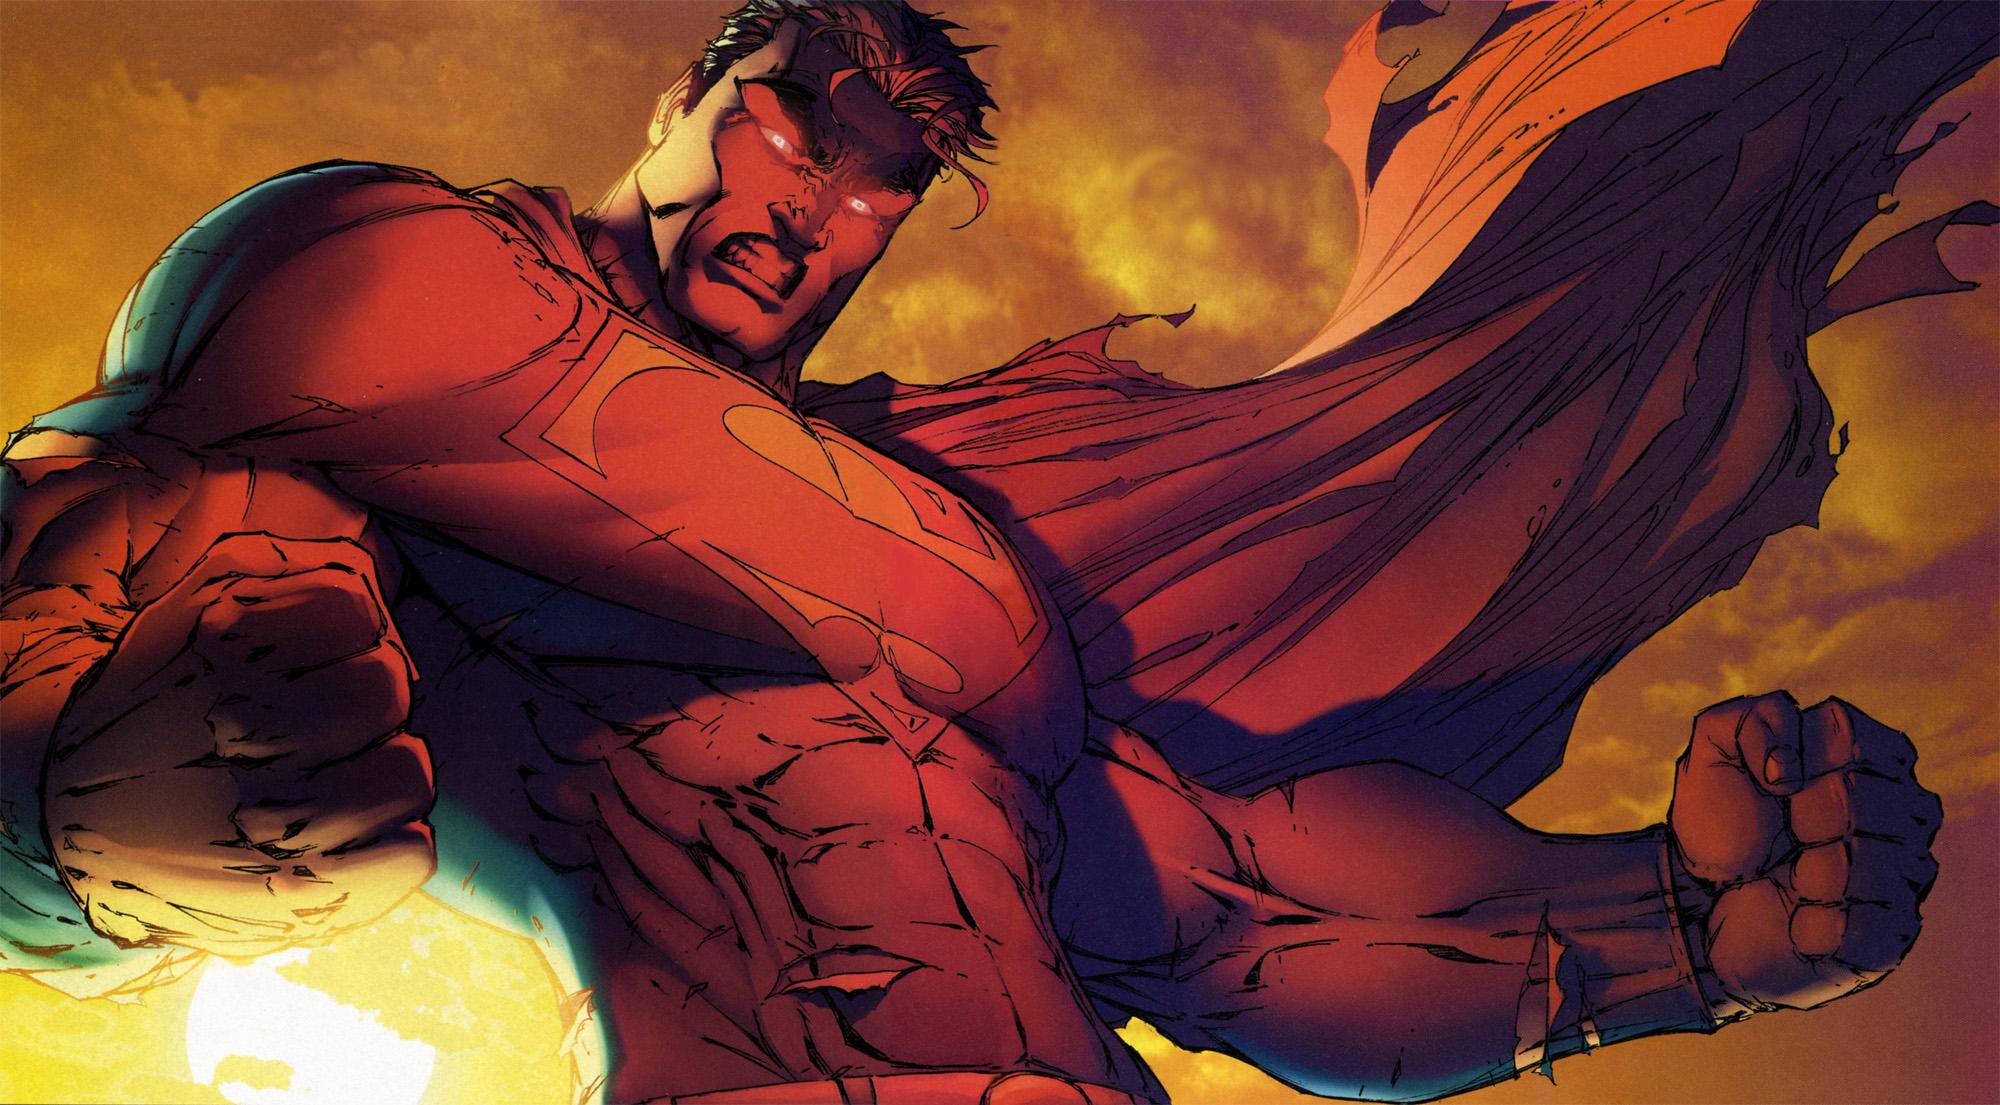 Best 35 Superman HD Wallpaper for Desktop 2000x1105